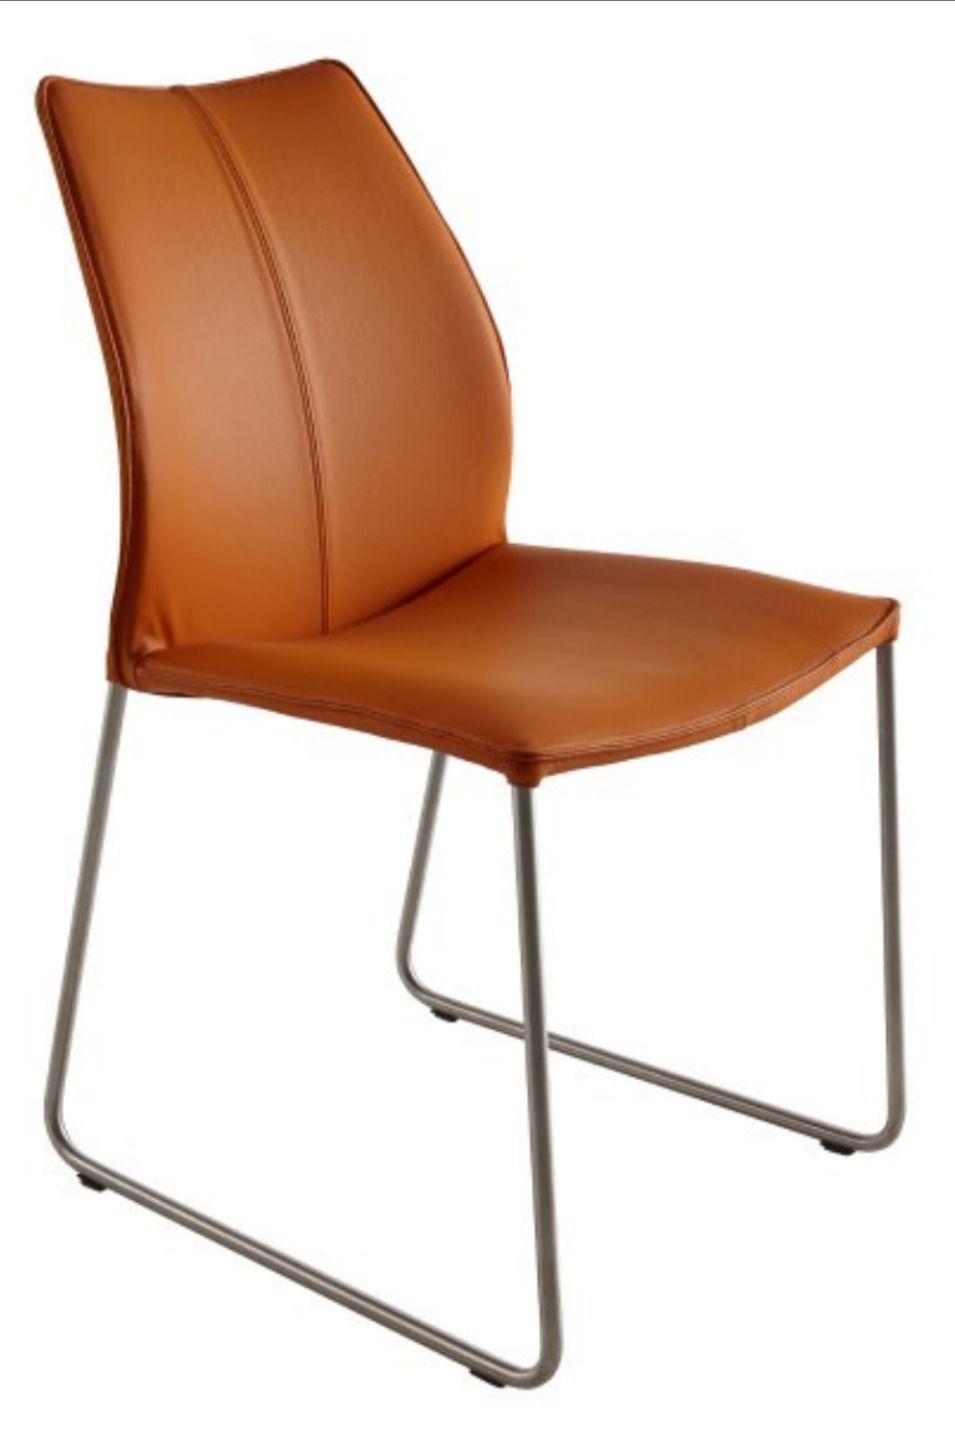 Pin Auf Stuhle Sessel Banke